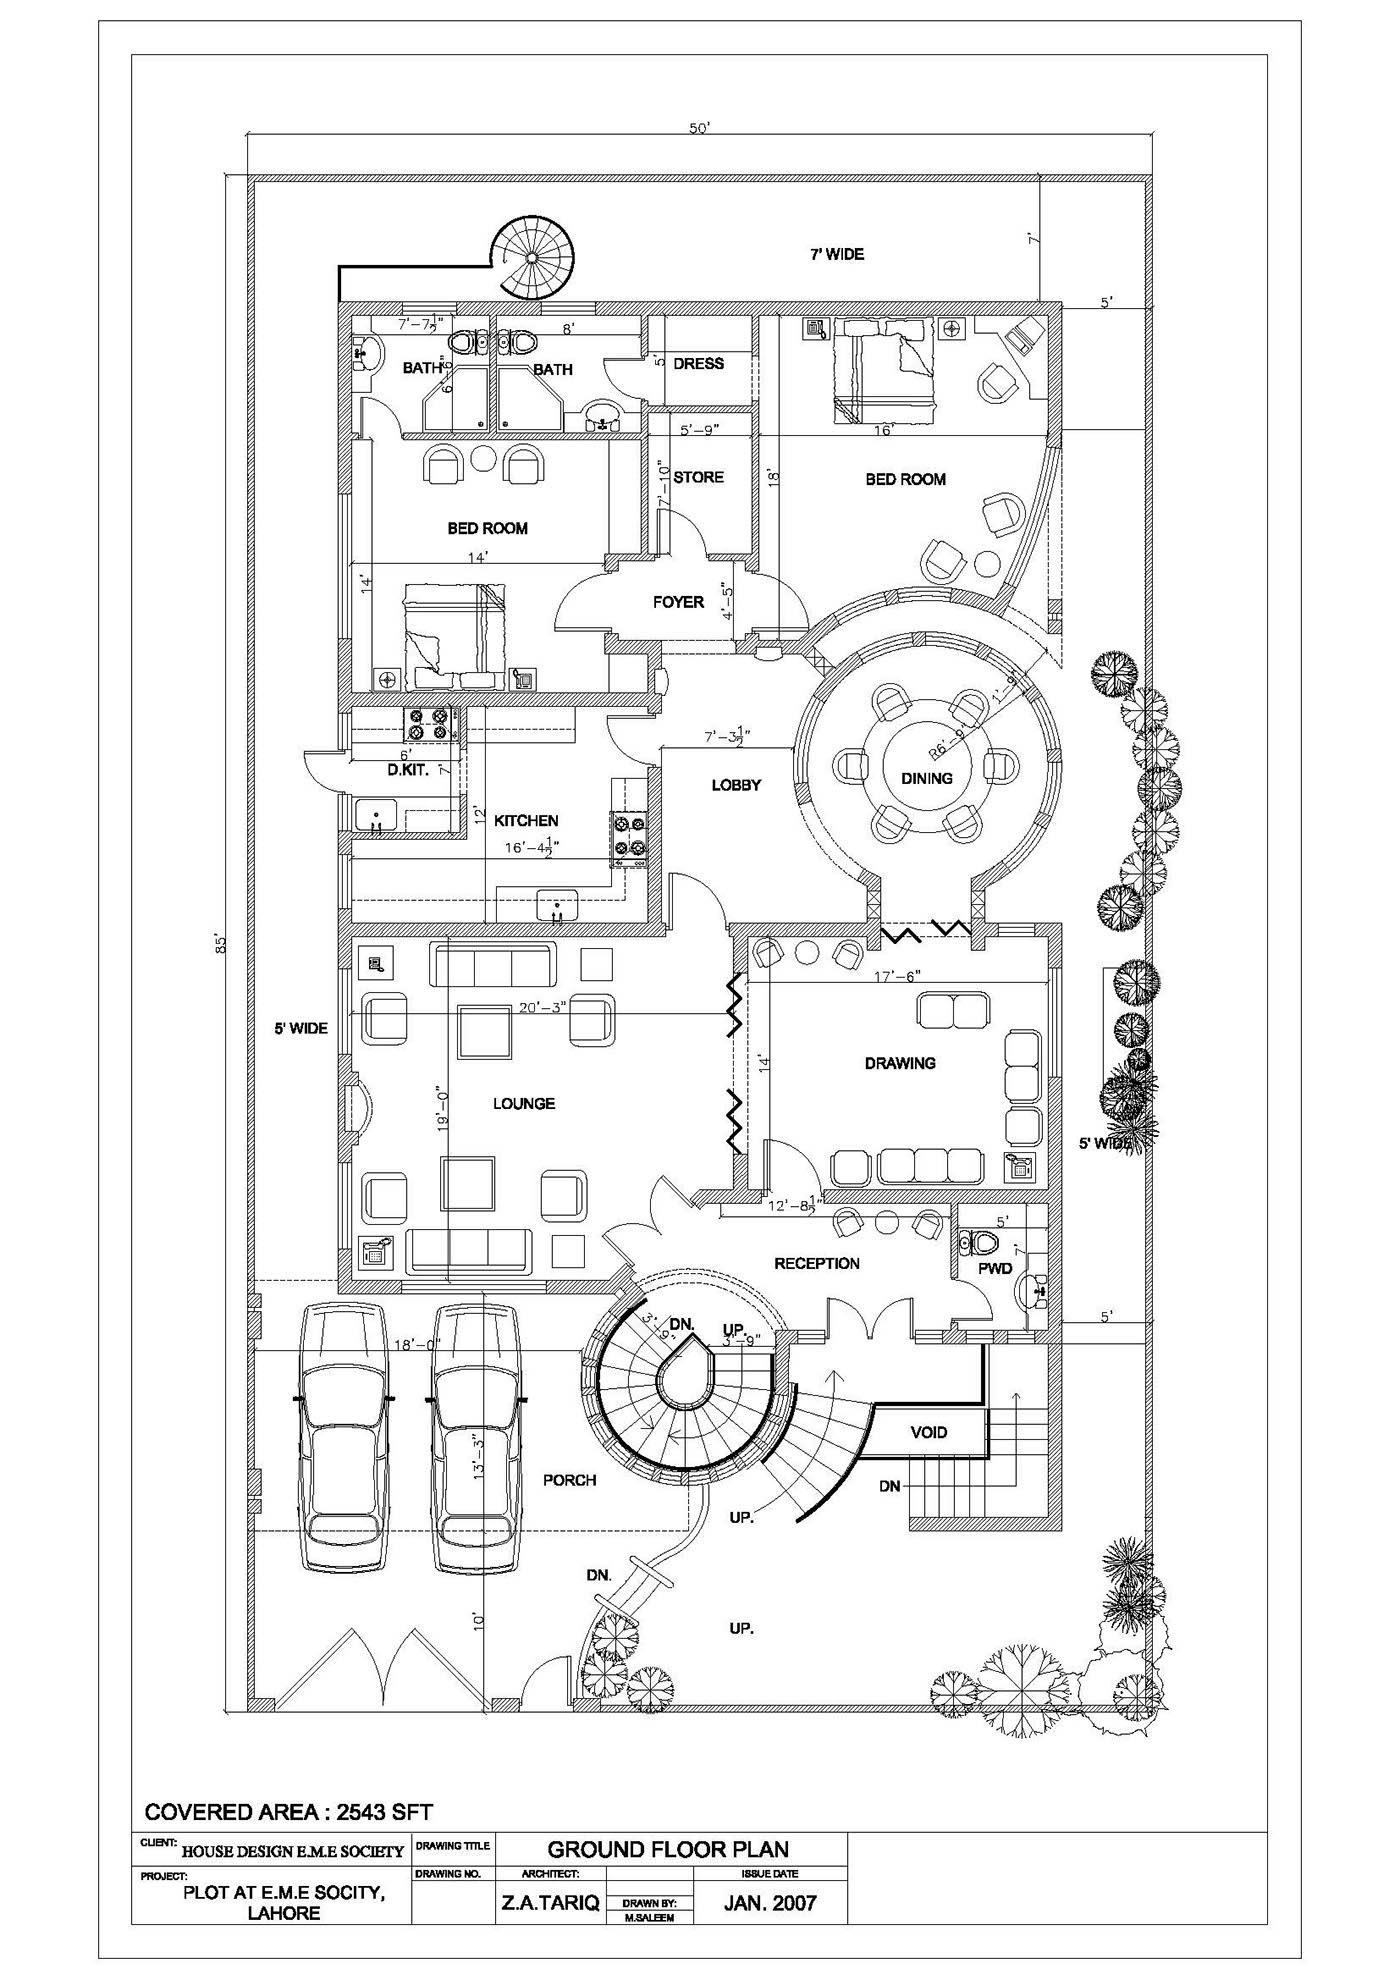 EME 2D Floor & Interior House Plan on Behance